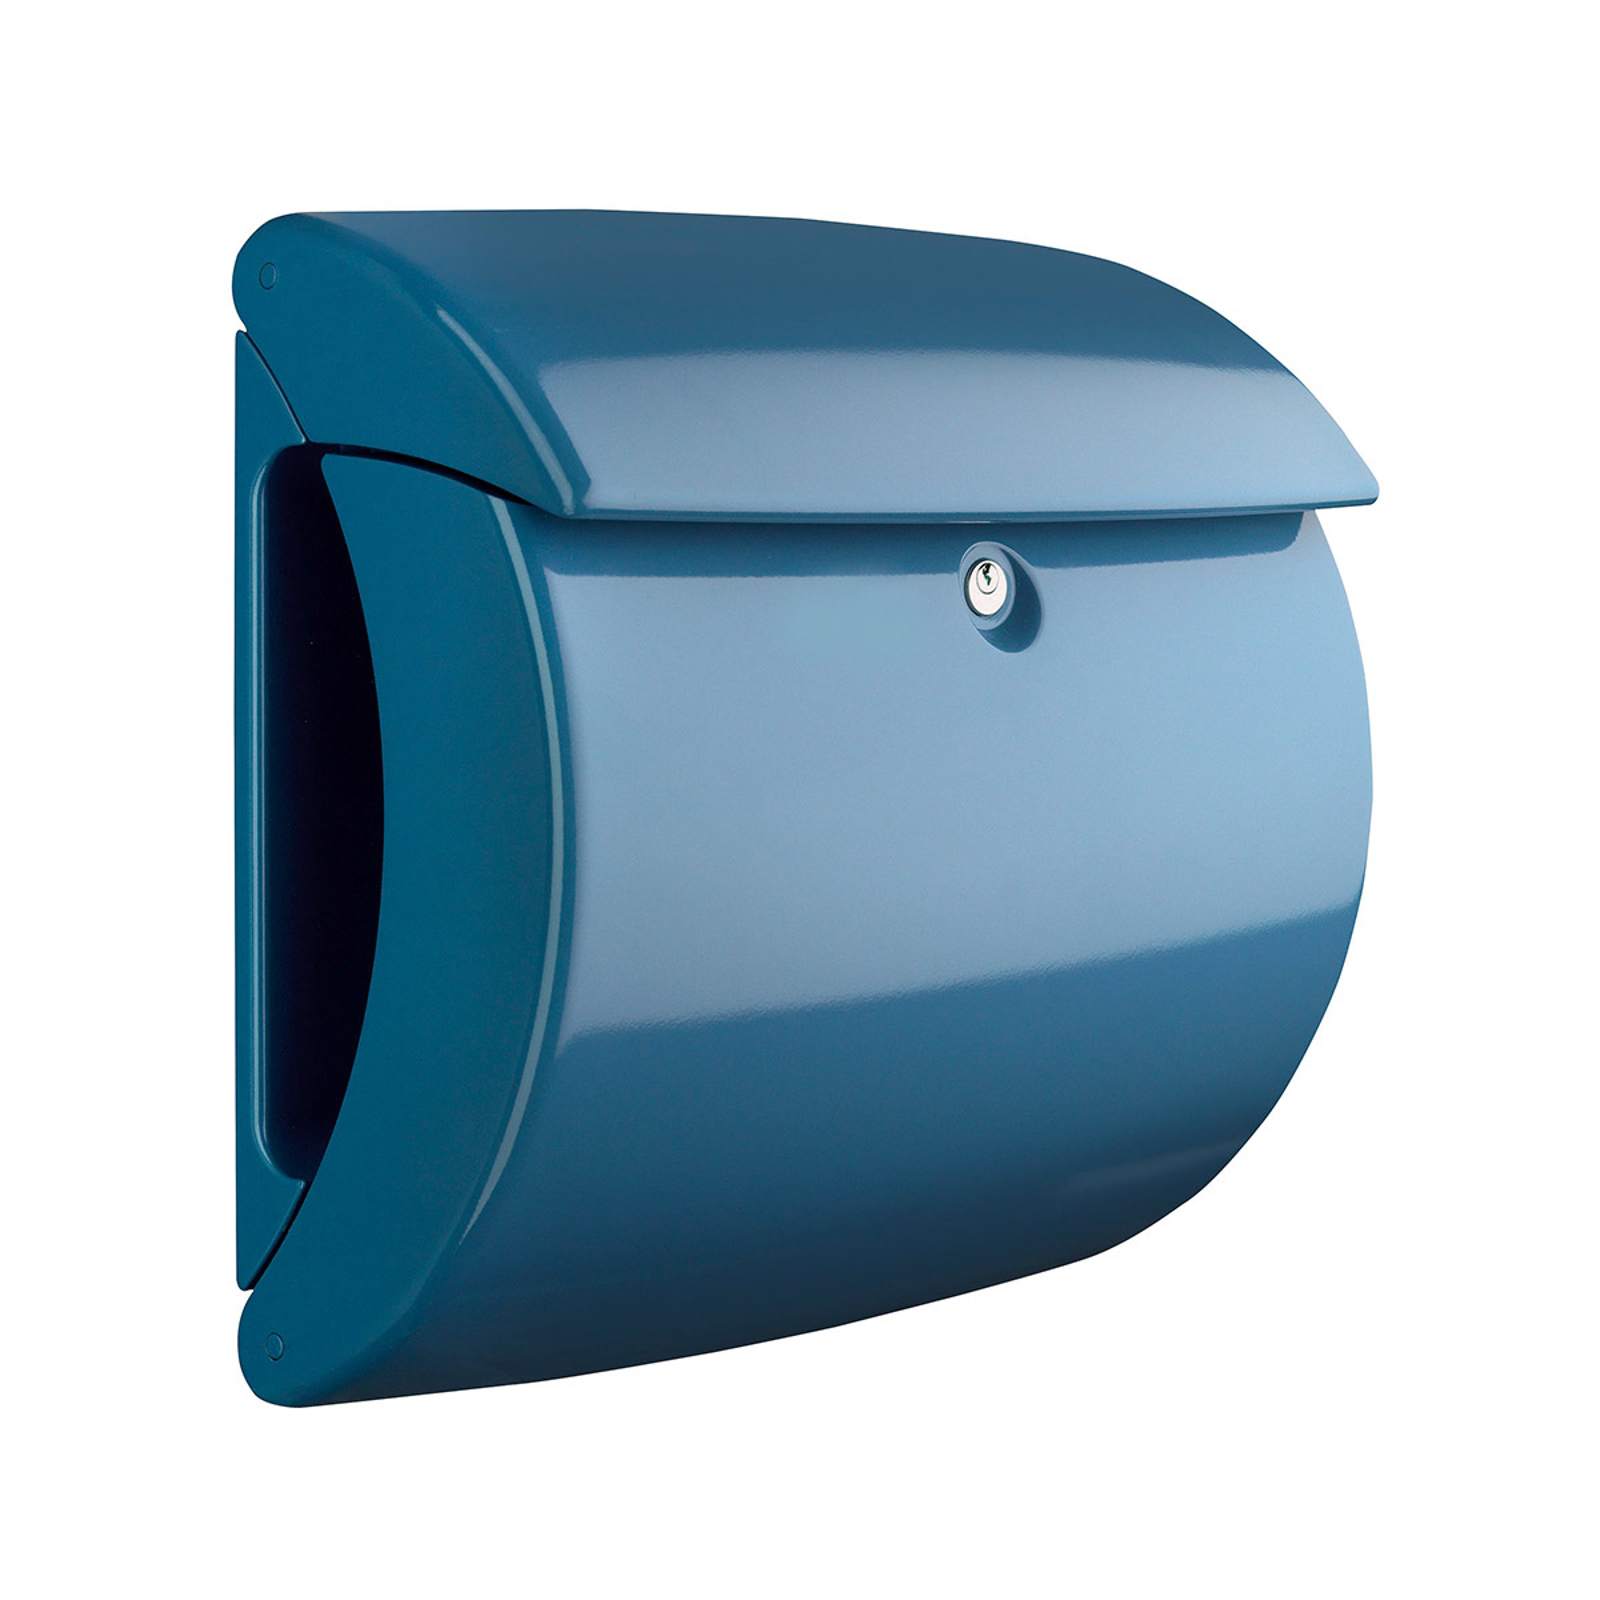 Postkasse Piano 886 light blue